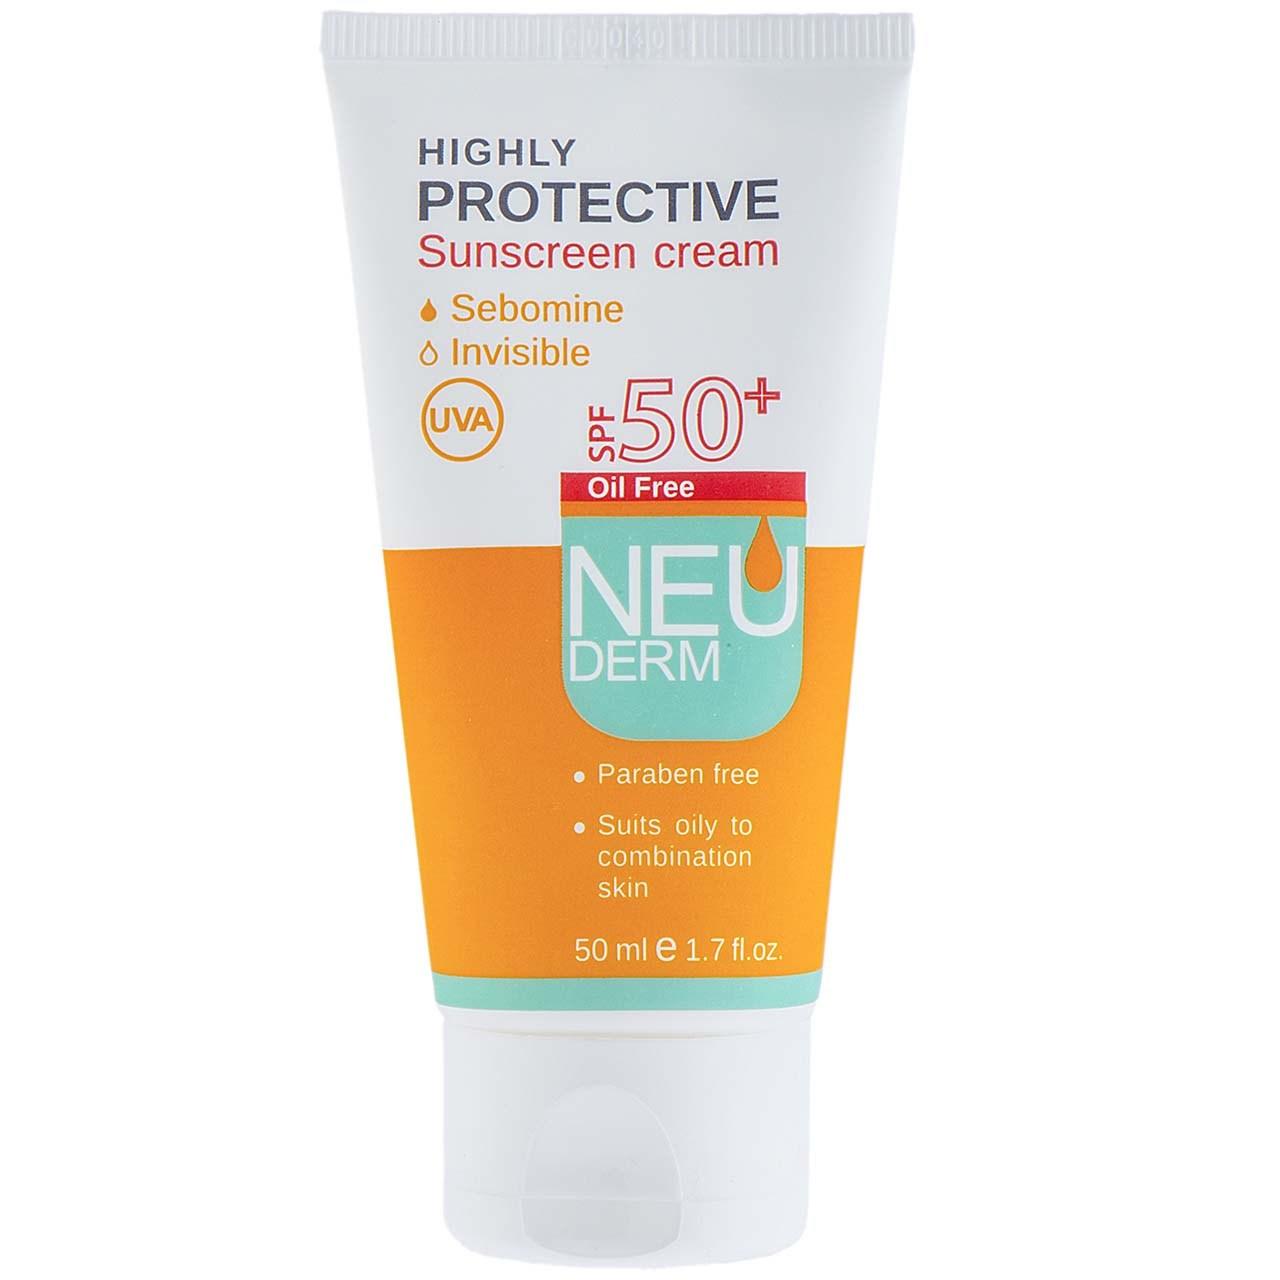 قیمت کرم ضد آفتاب نئودرم مدل Highly Protective SPF50 حجم 50 میلی لیتر